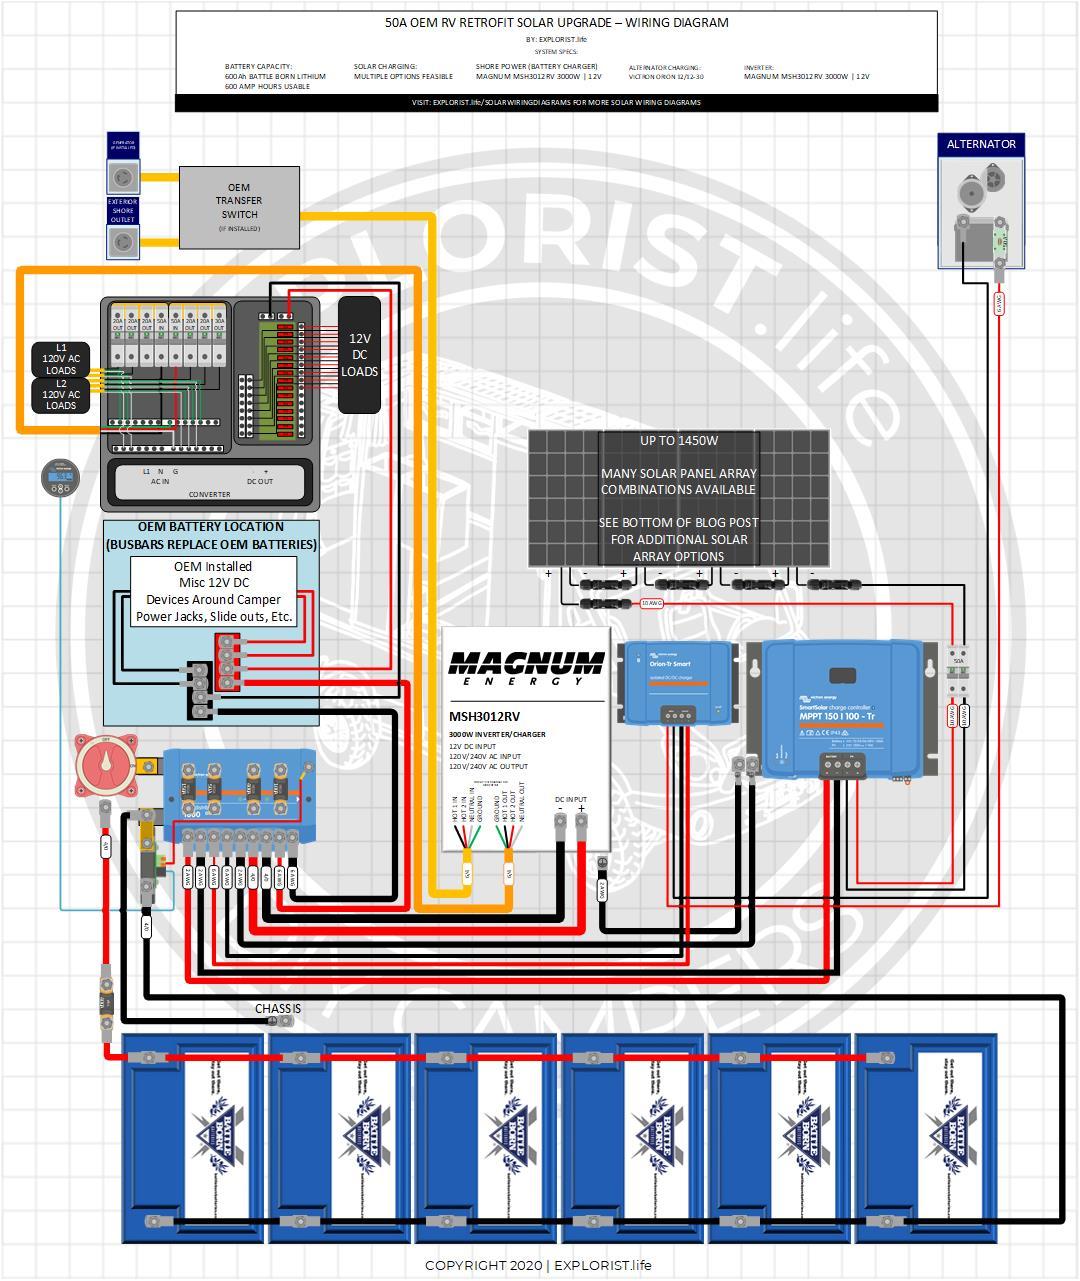 50A Camper – Inverter W/ Solar & Alternator Charging – High Res Wiring  Diagram – EXPLORIST.lifeEXPLORIST.life